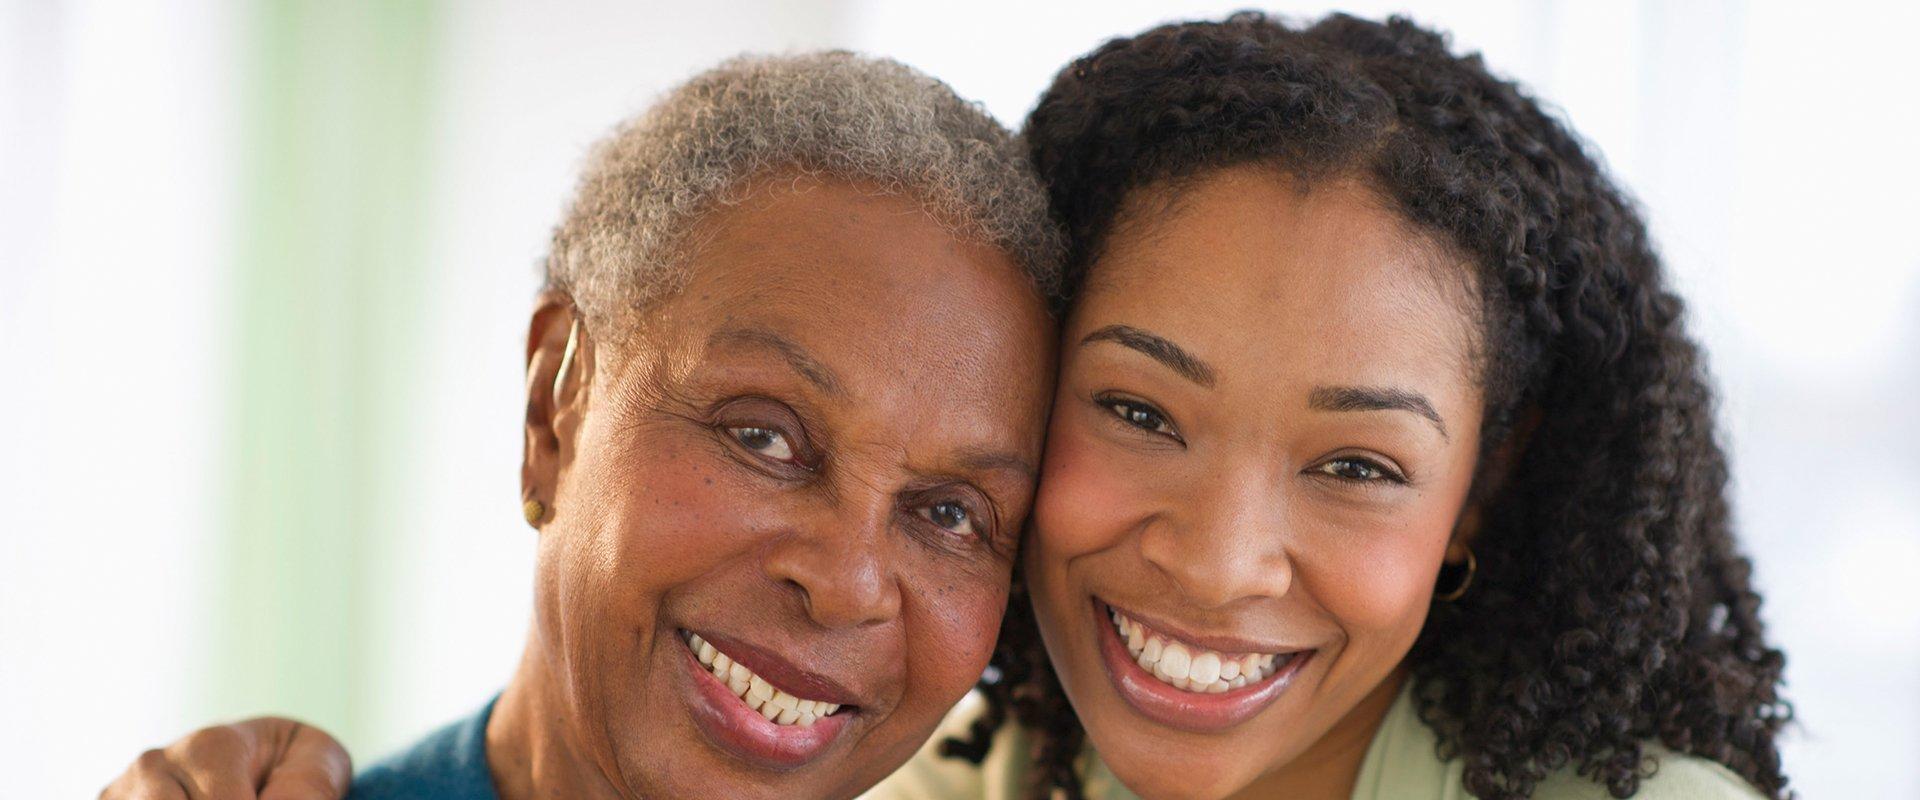 Afro-American Women